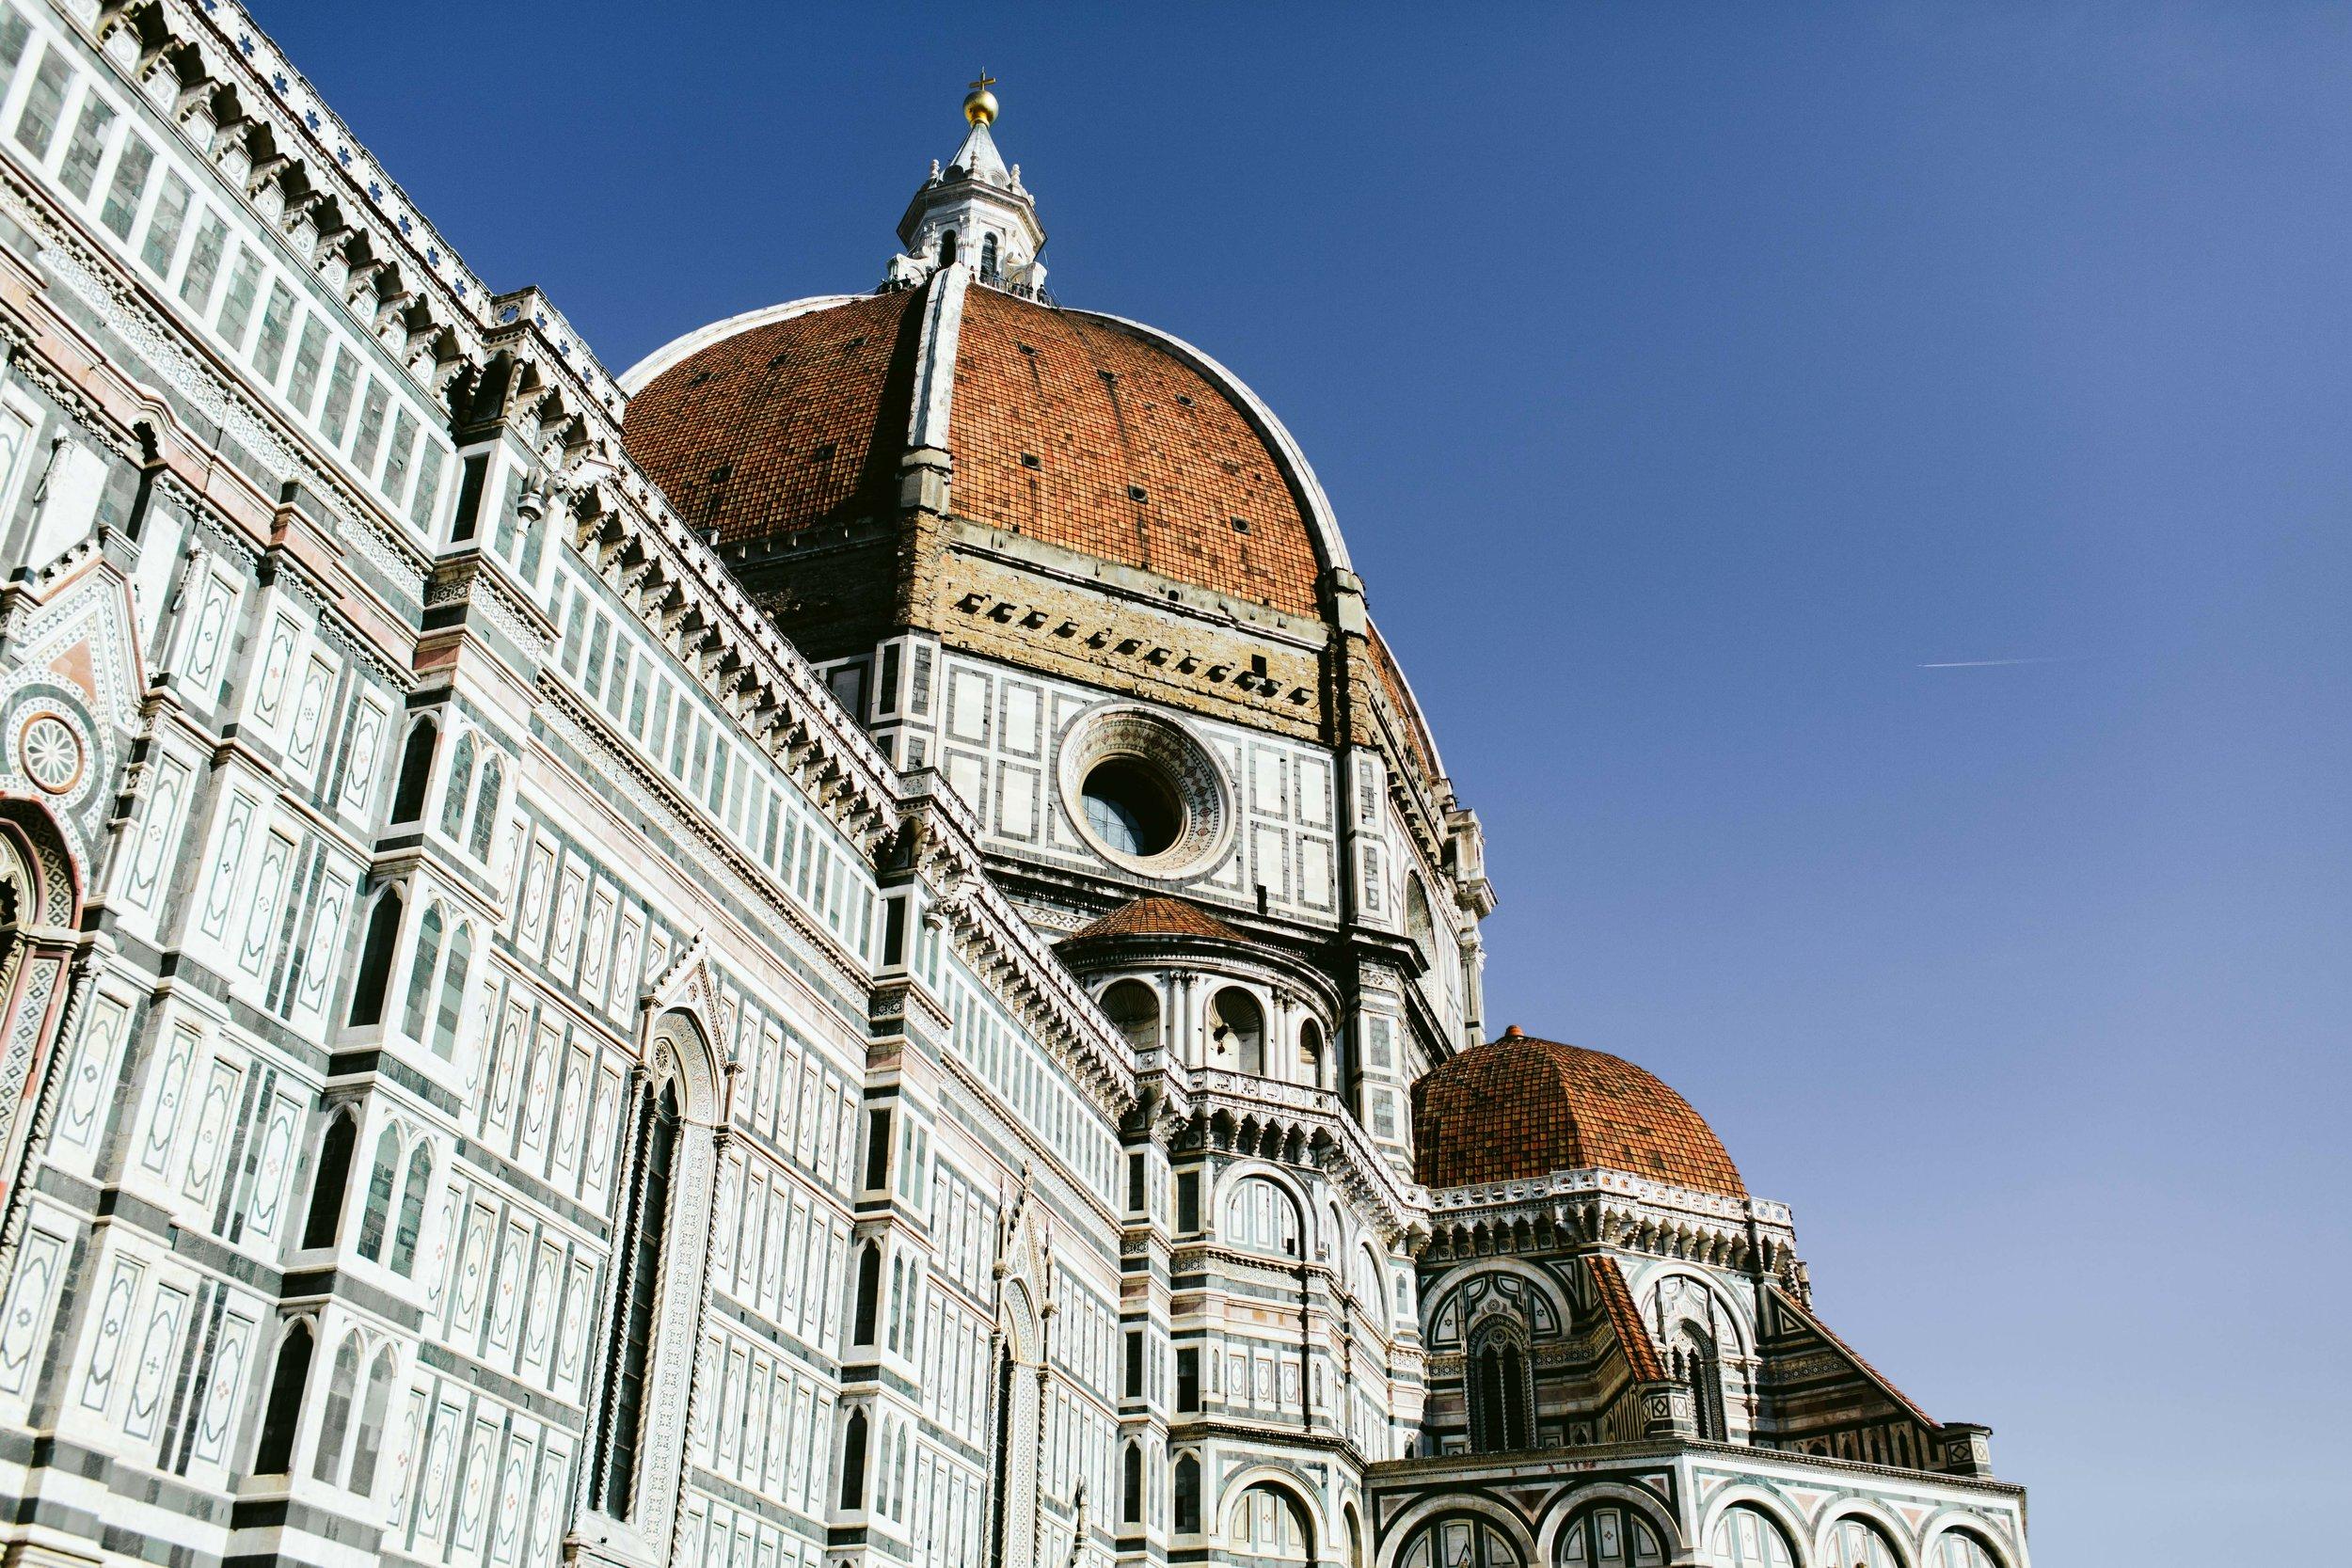 ITALY2015-318-7.jpg